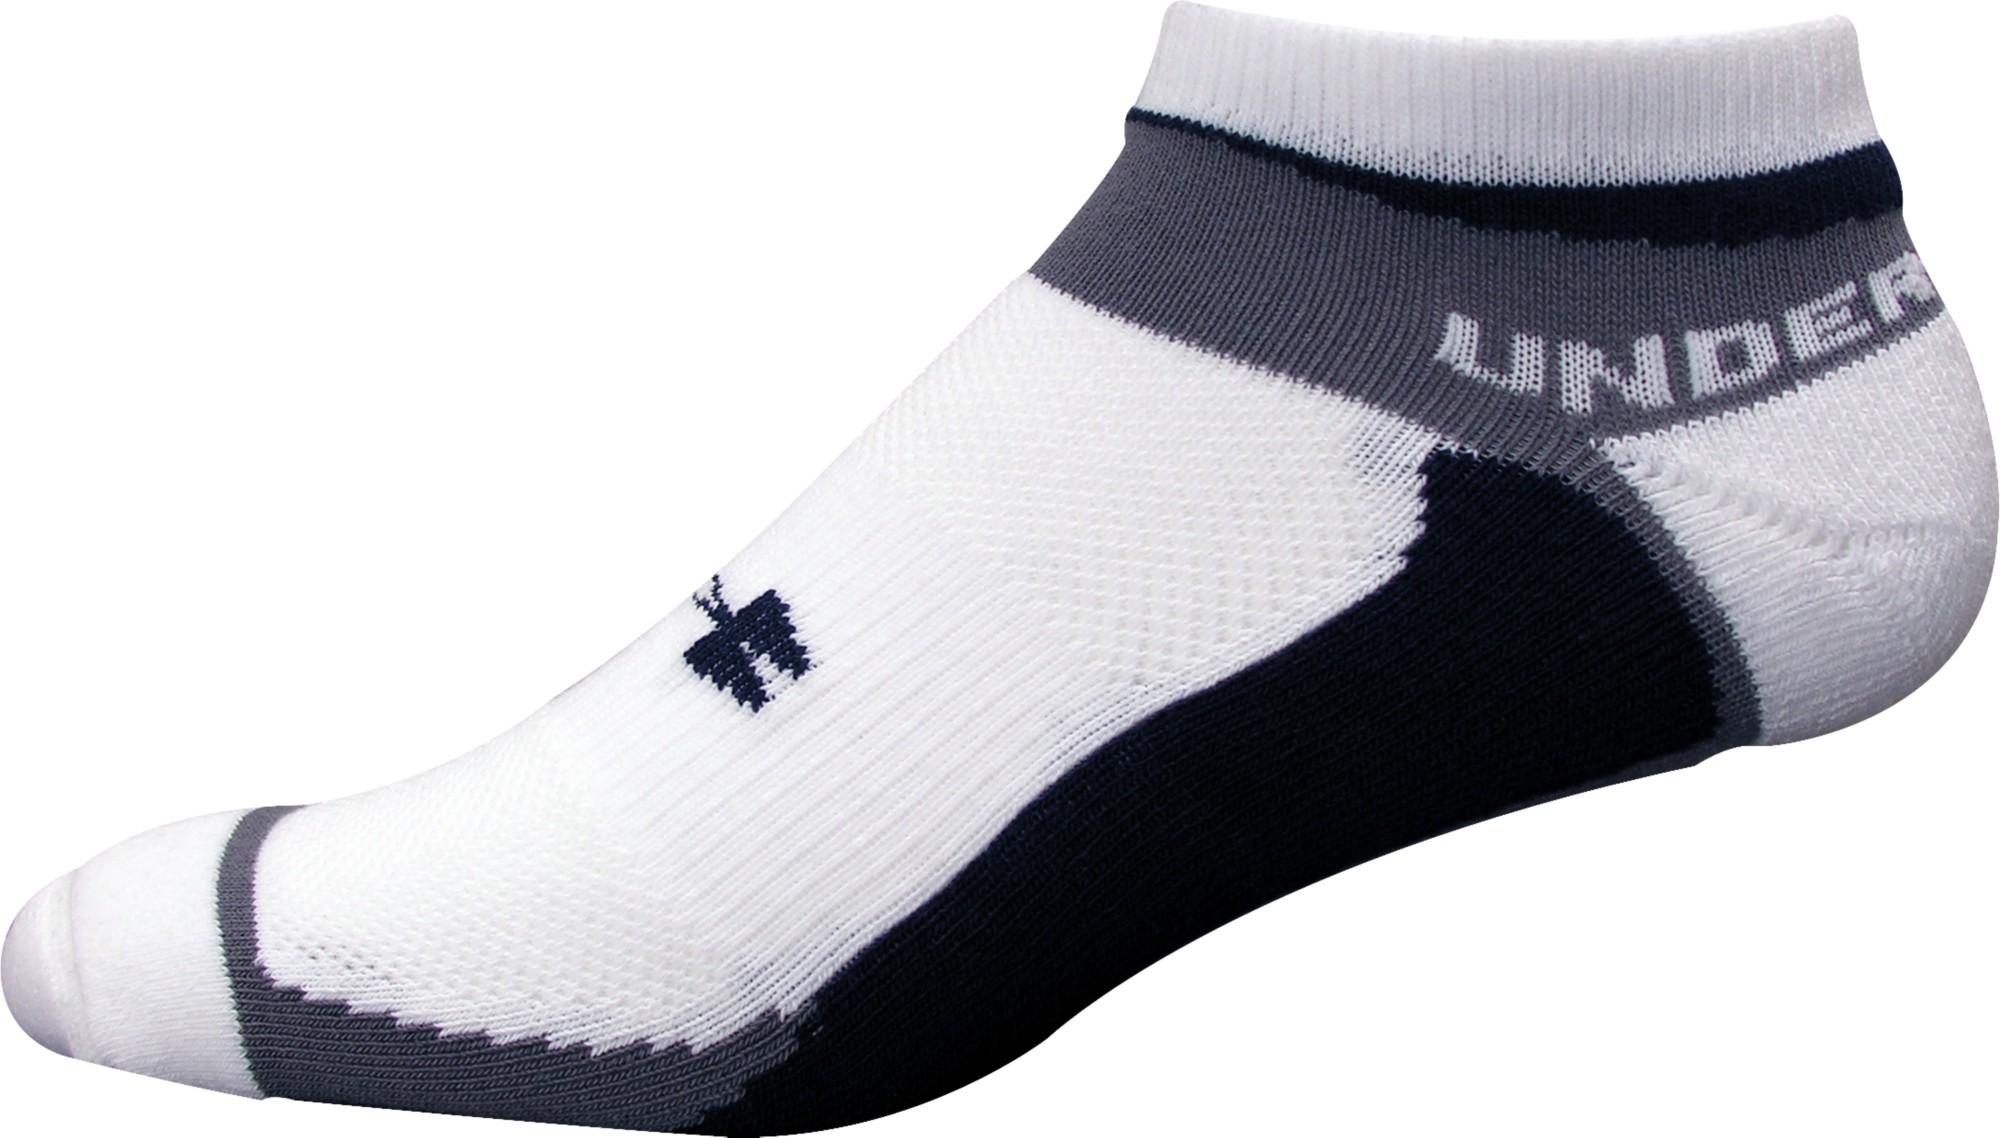 Under Armour DCE Evade Socks